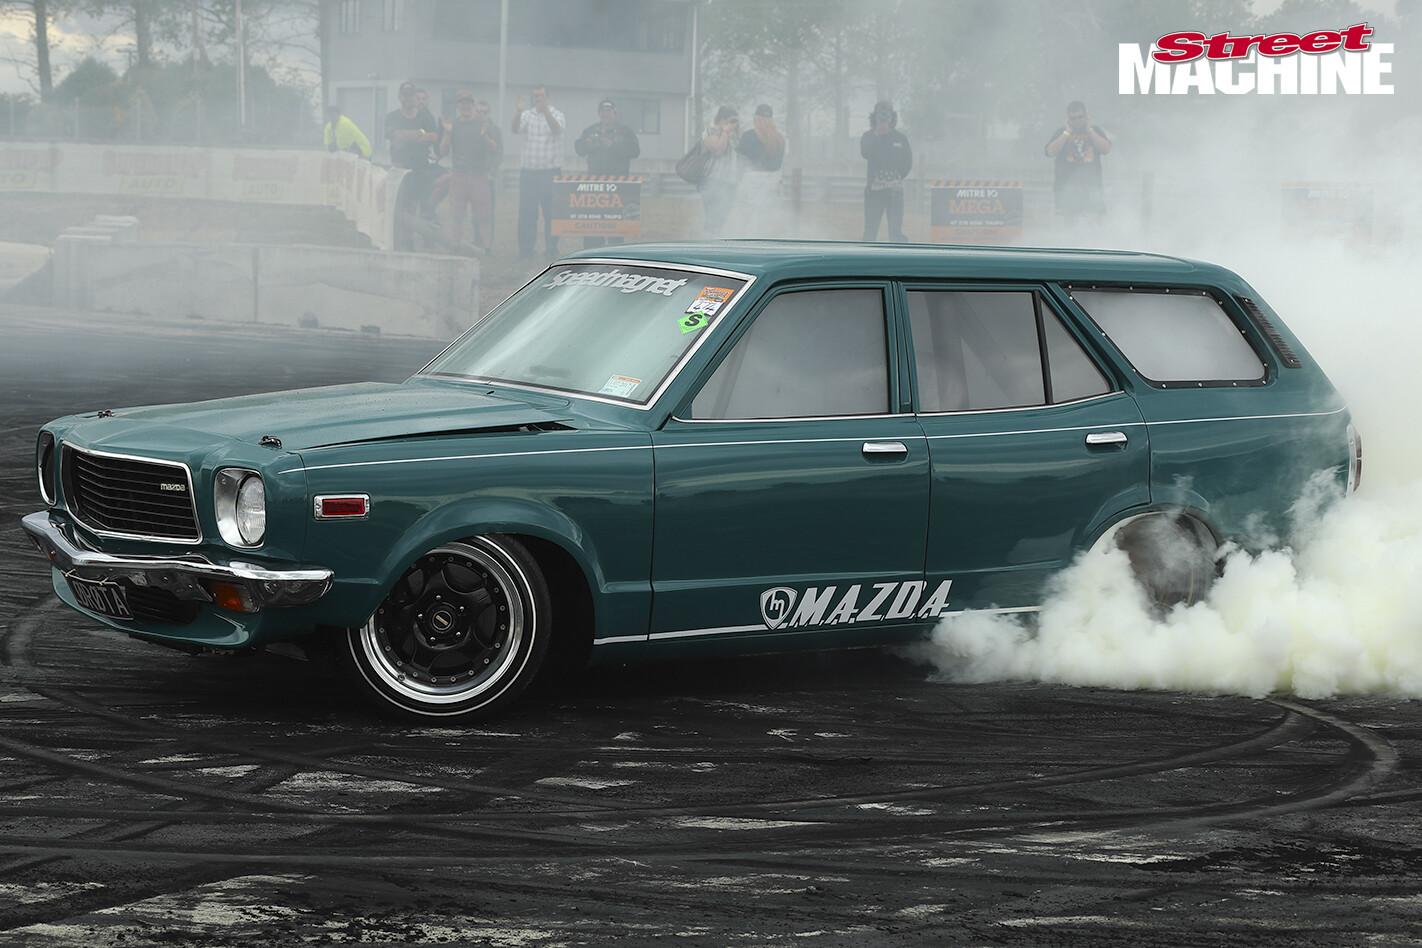 6_Mazda RX3 Wagon Burnout For Web